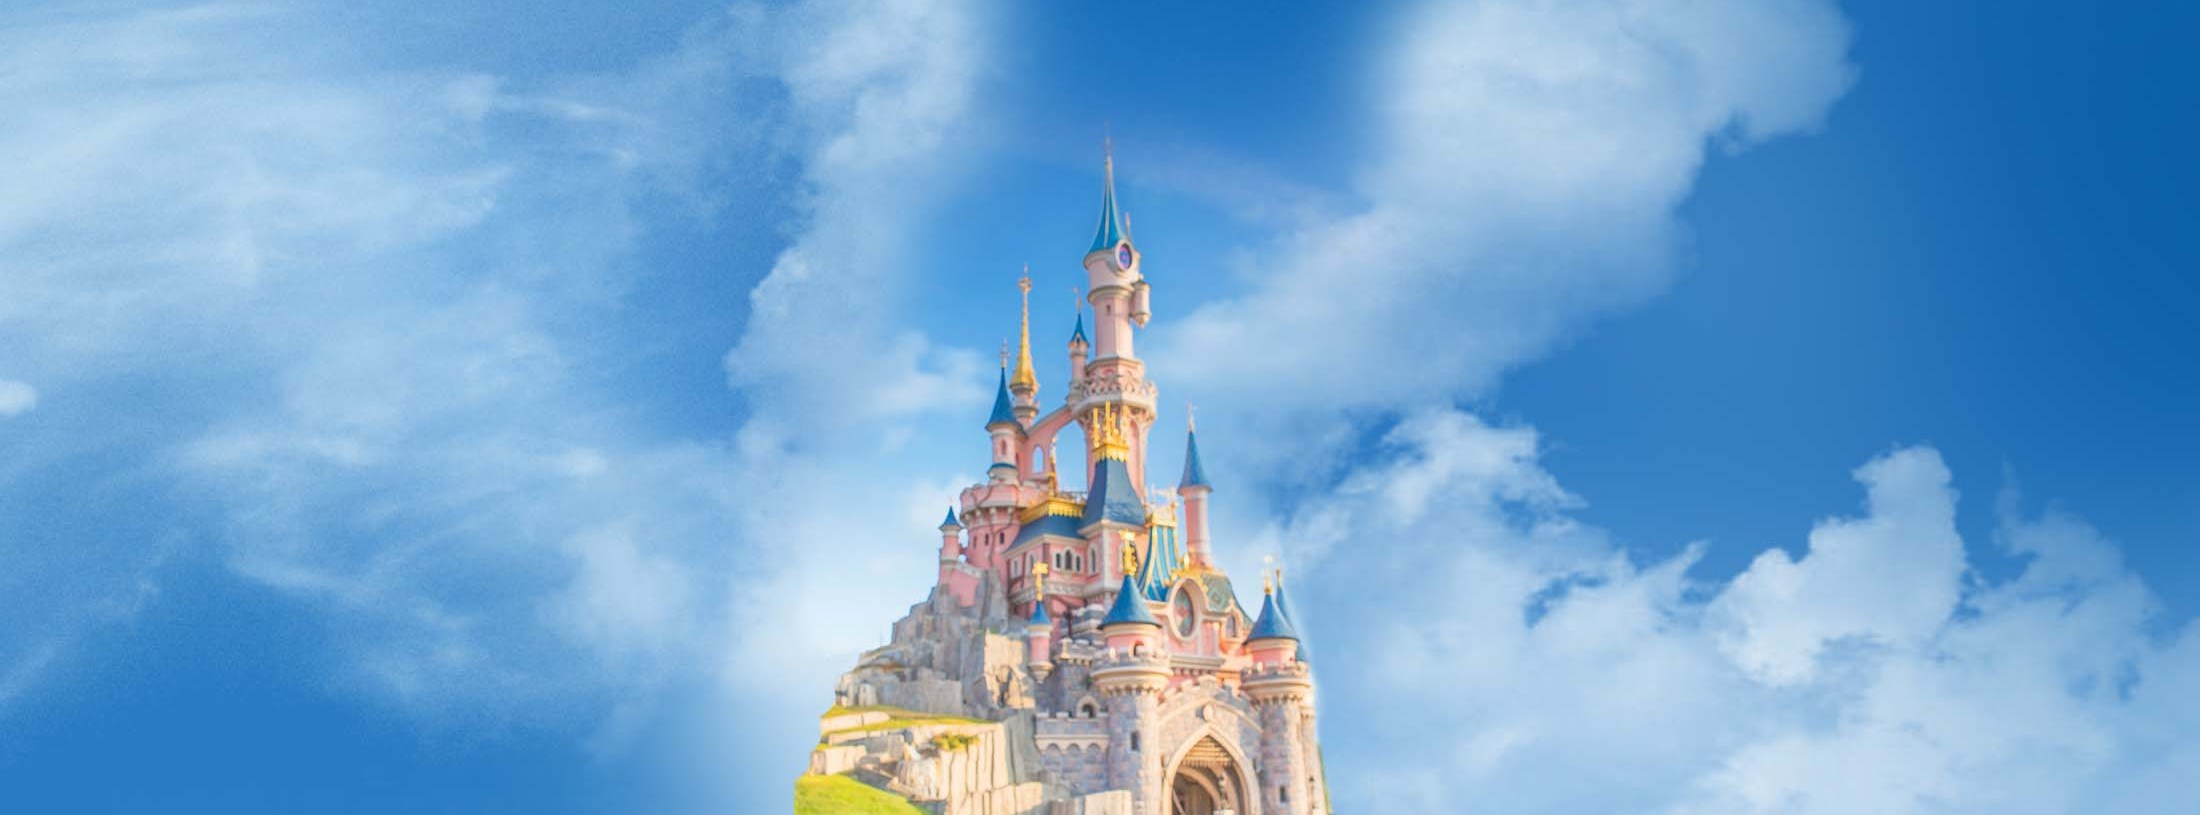 Hotels Near Disneyland With Free Shuttle